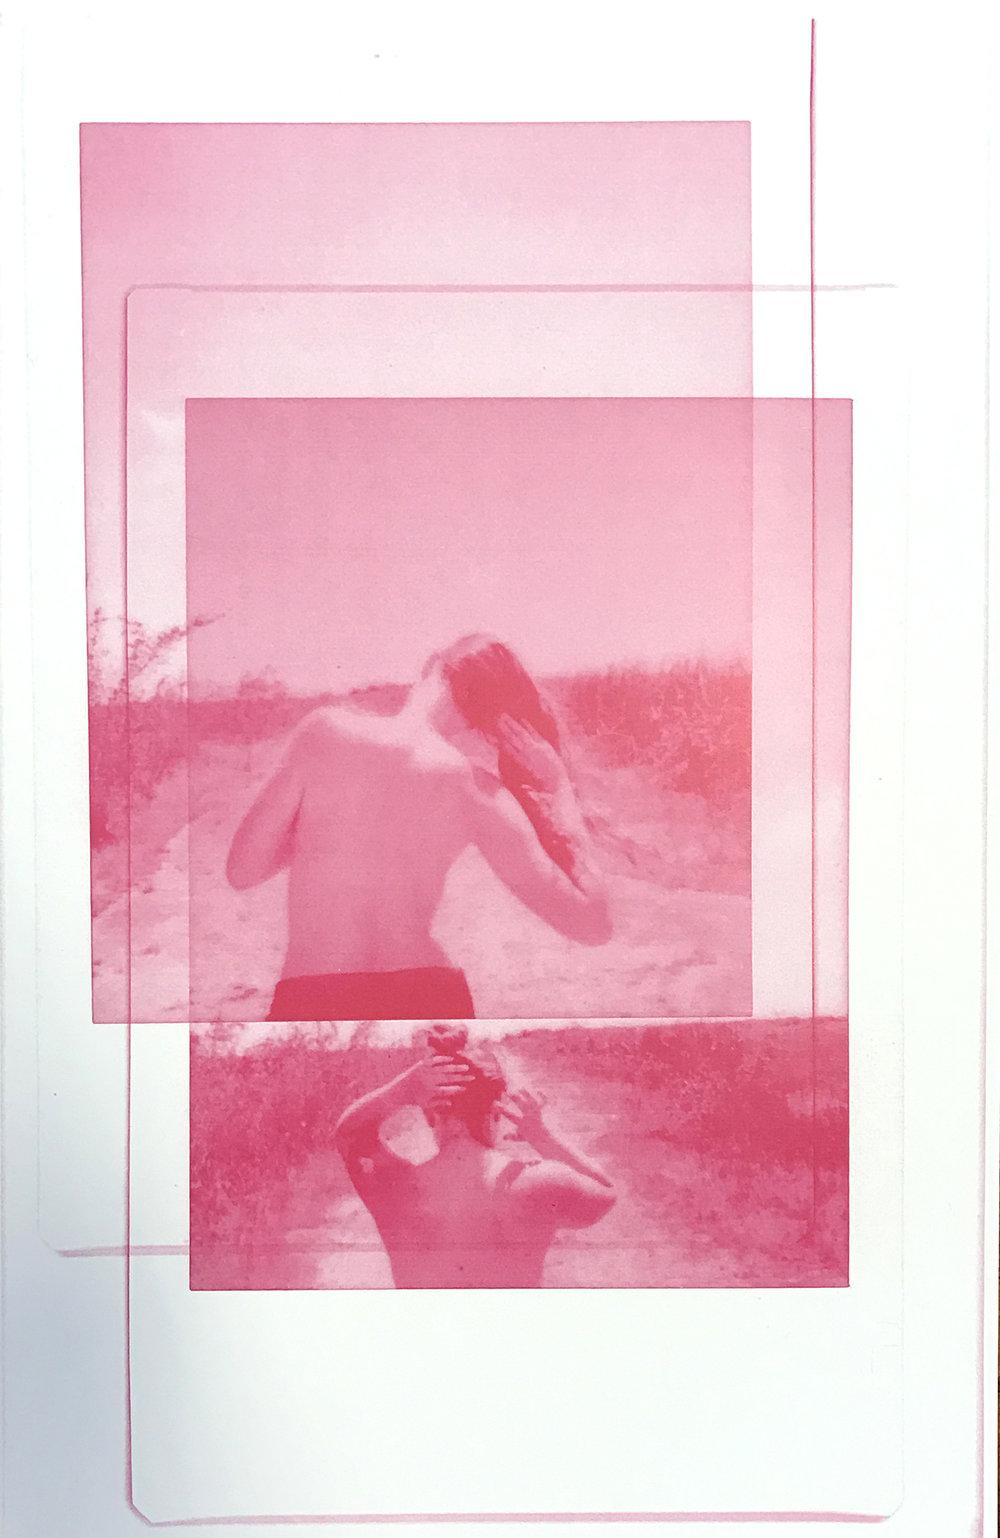 Sarah_Henderson-Everglades Girls-5.jpg